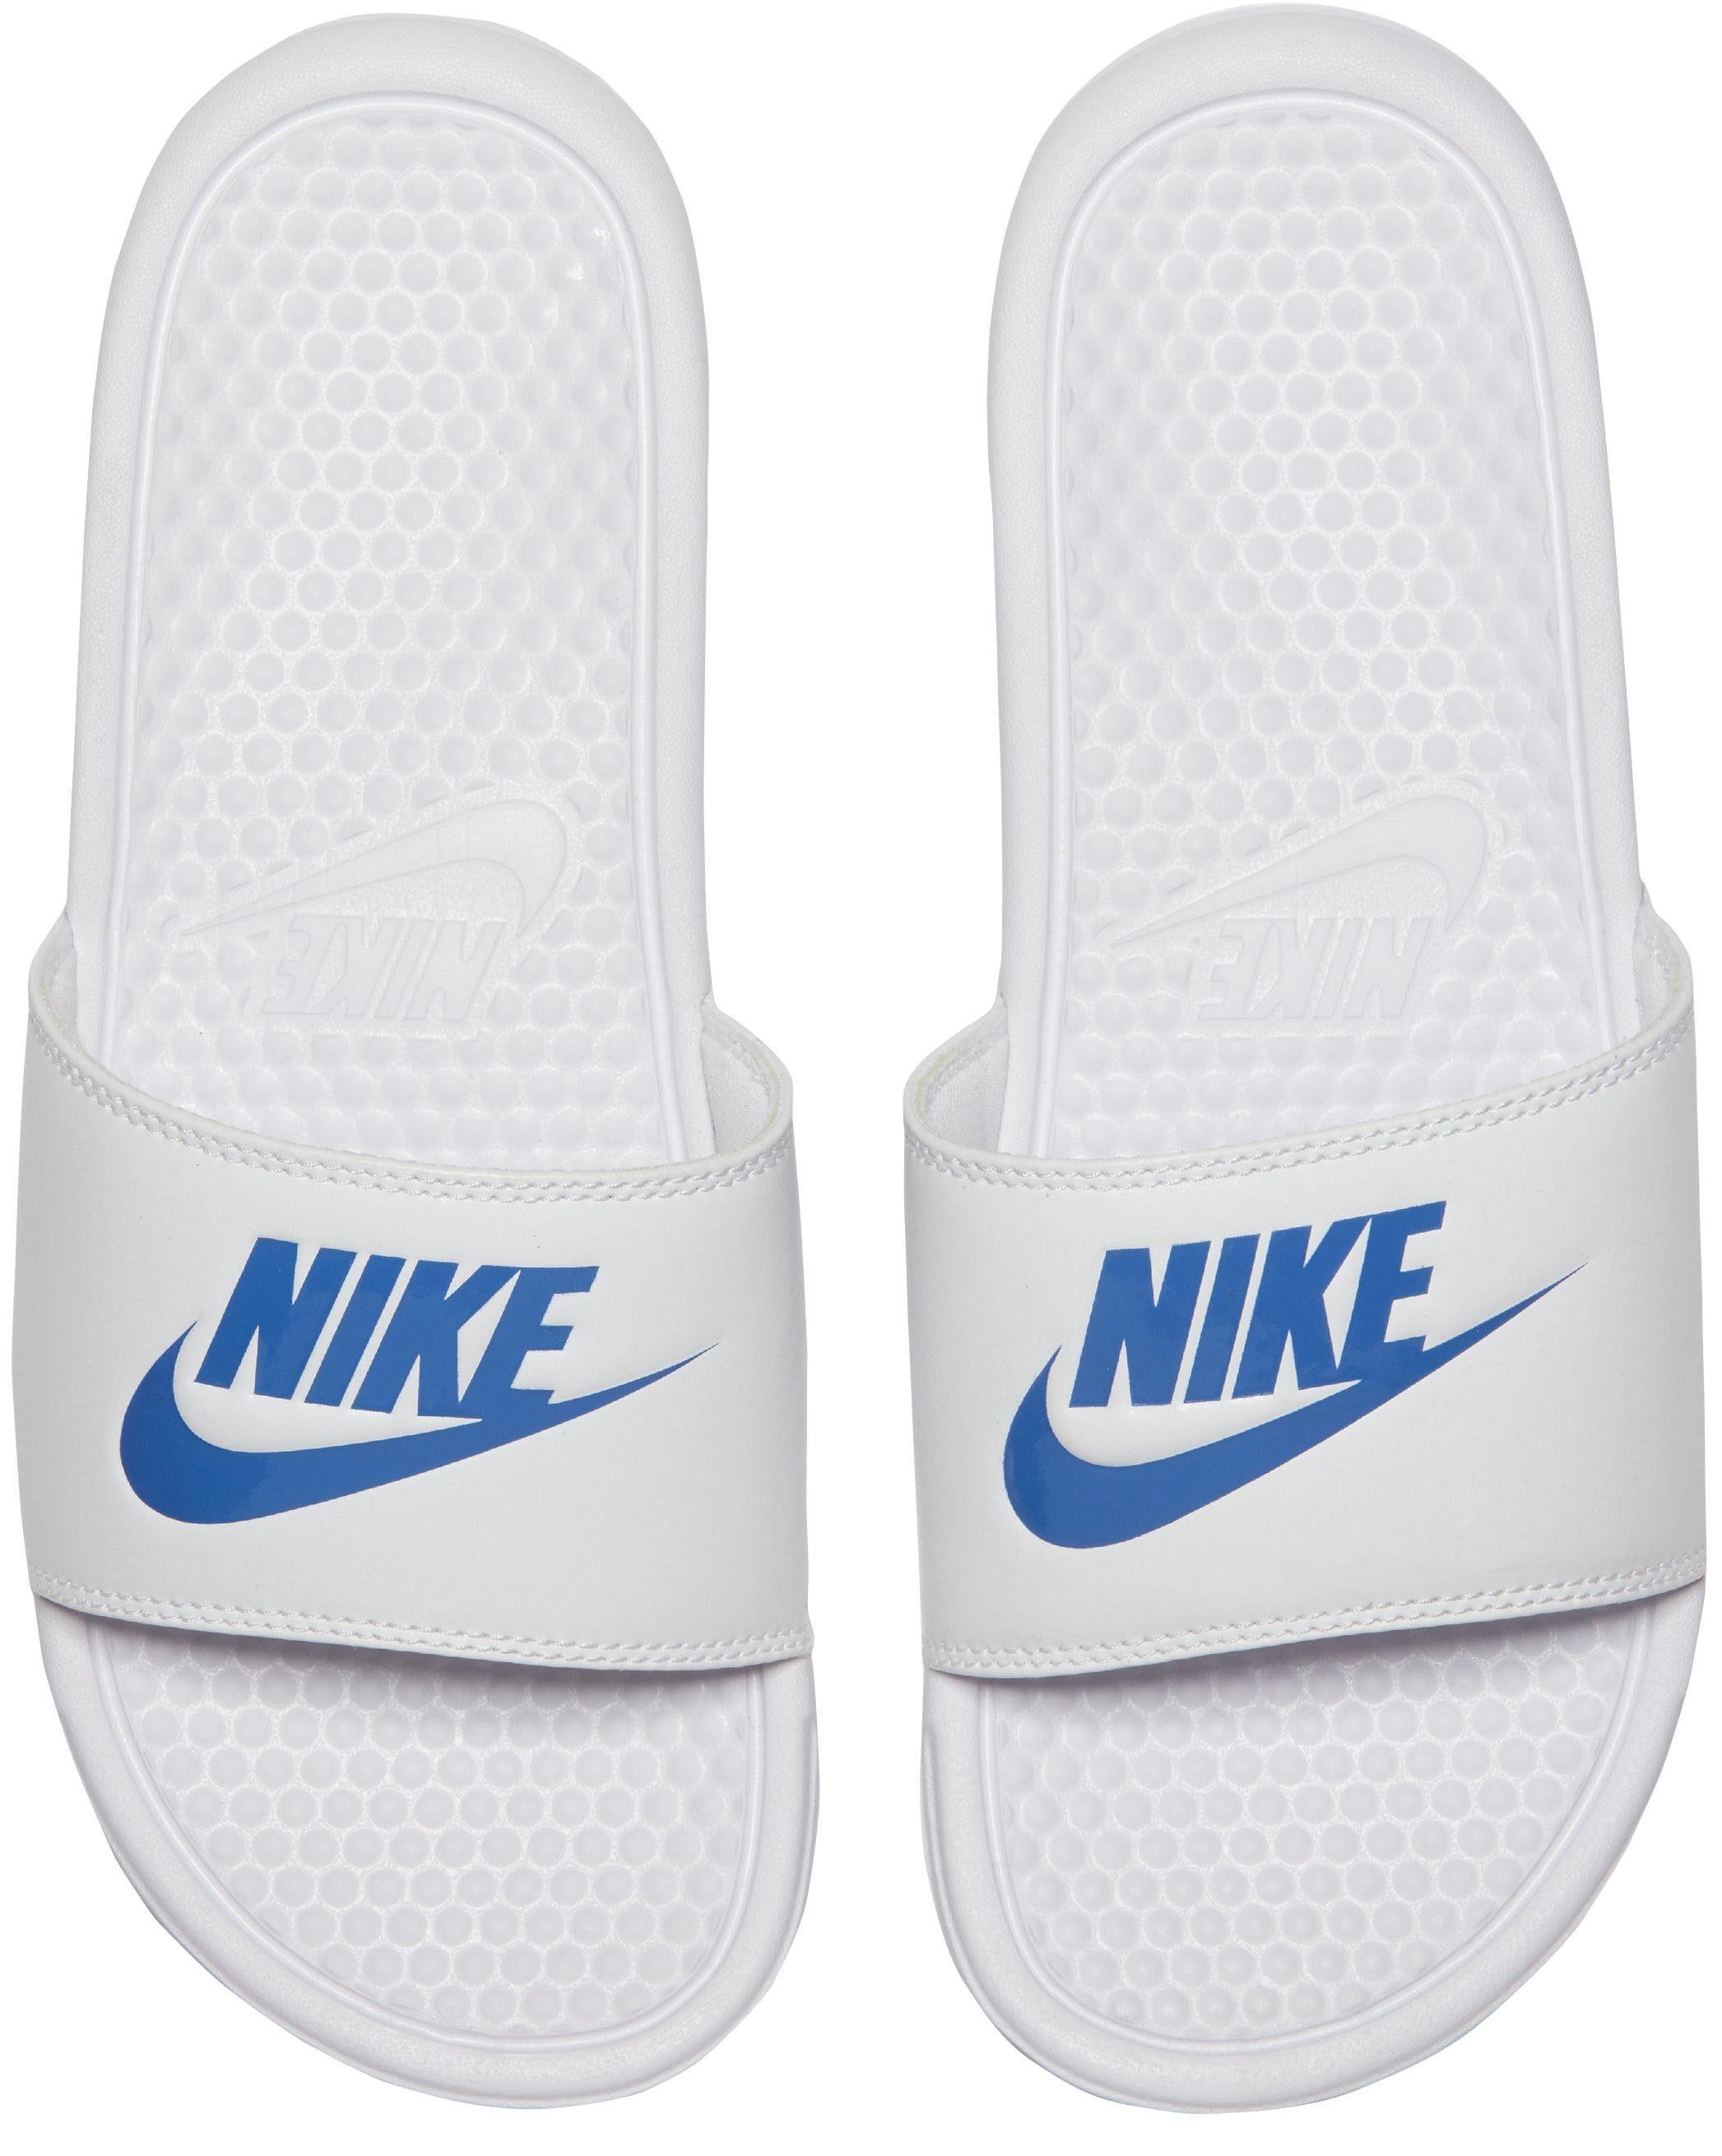 Nike Sportswear »Benassi Just do it« Badesandale | OTTO